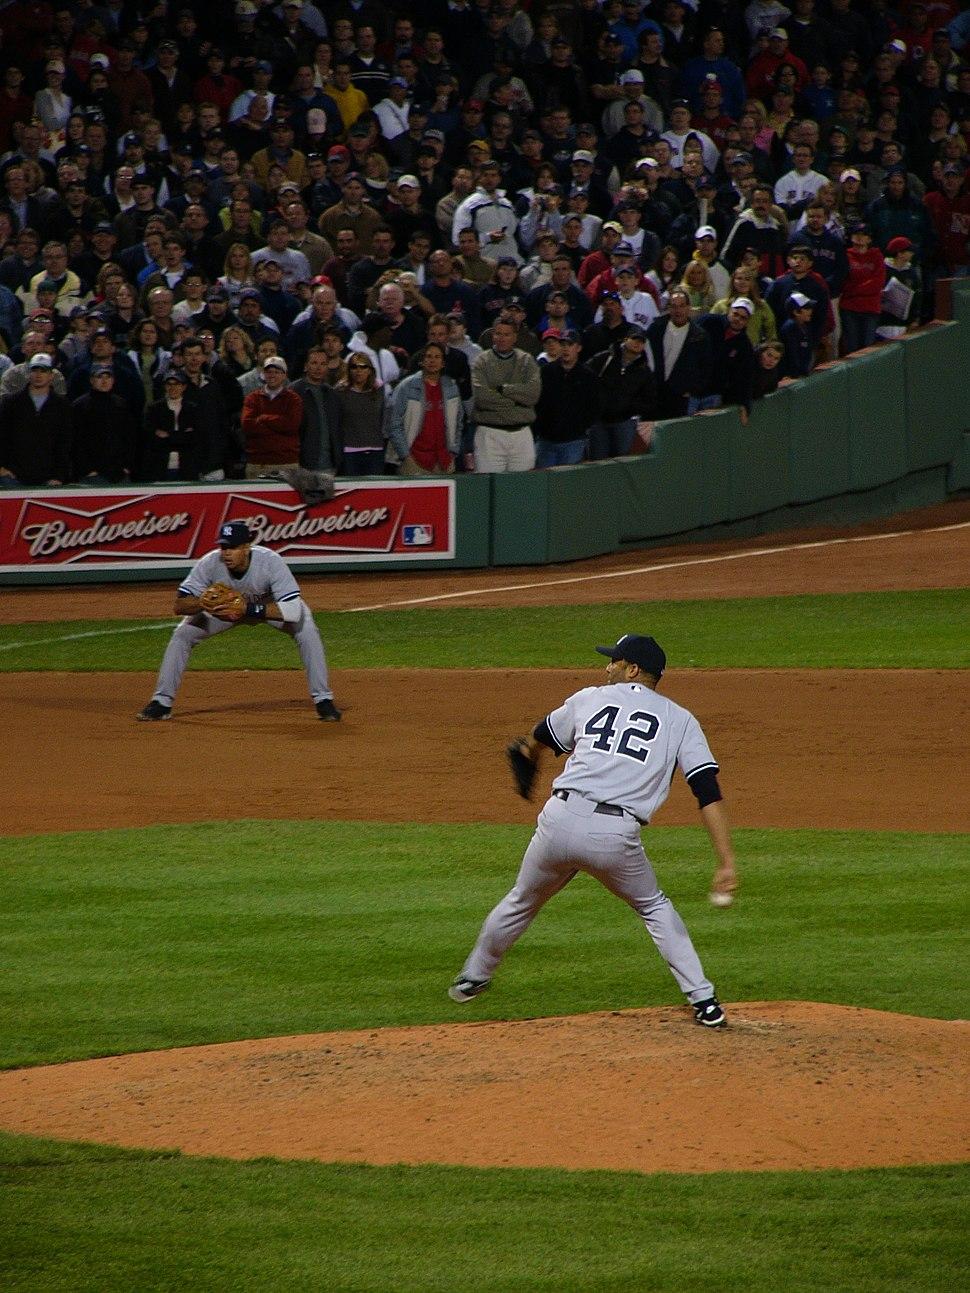 Mariano Rivera vs Red Sox in 2006